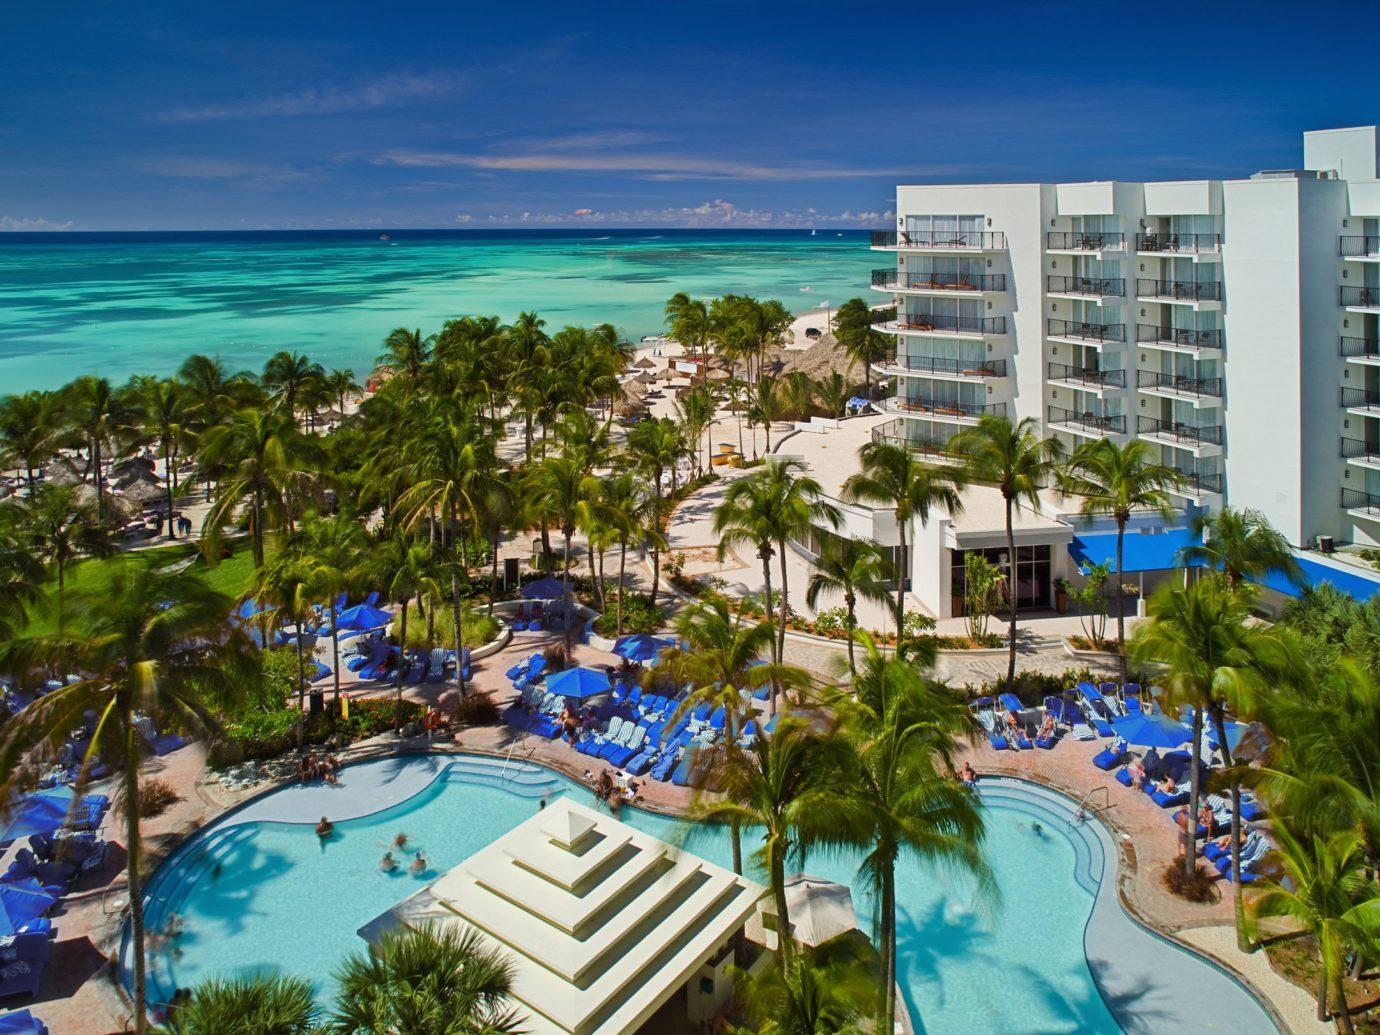 Aruba caribbean Hotels Resort leisure resort town swimming pool vacation tourism condominium hotel real estate mixed use palm tree arecales tropics City sky tree water recreation bay